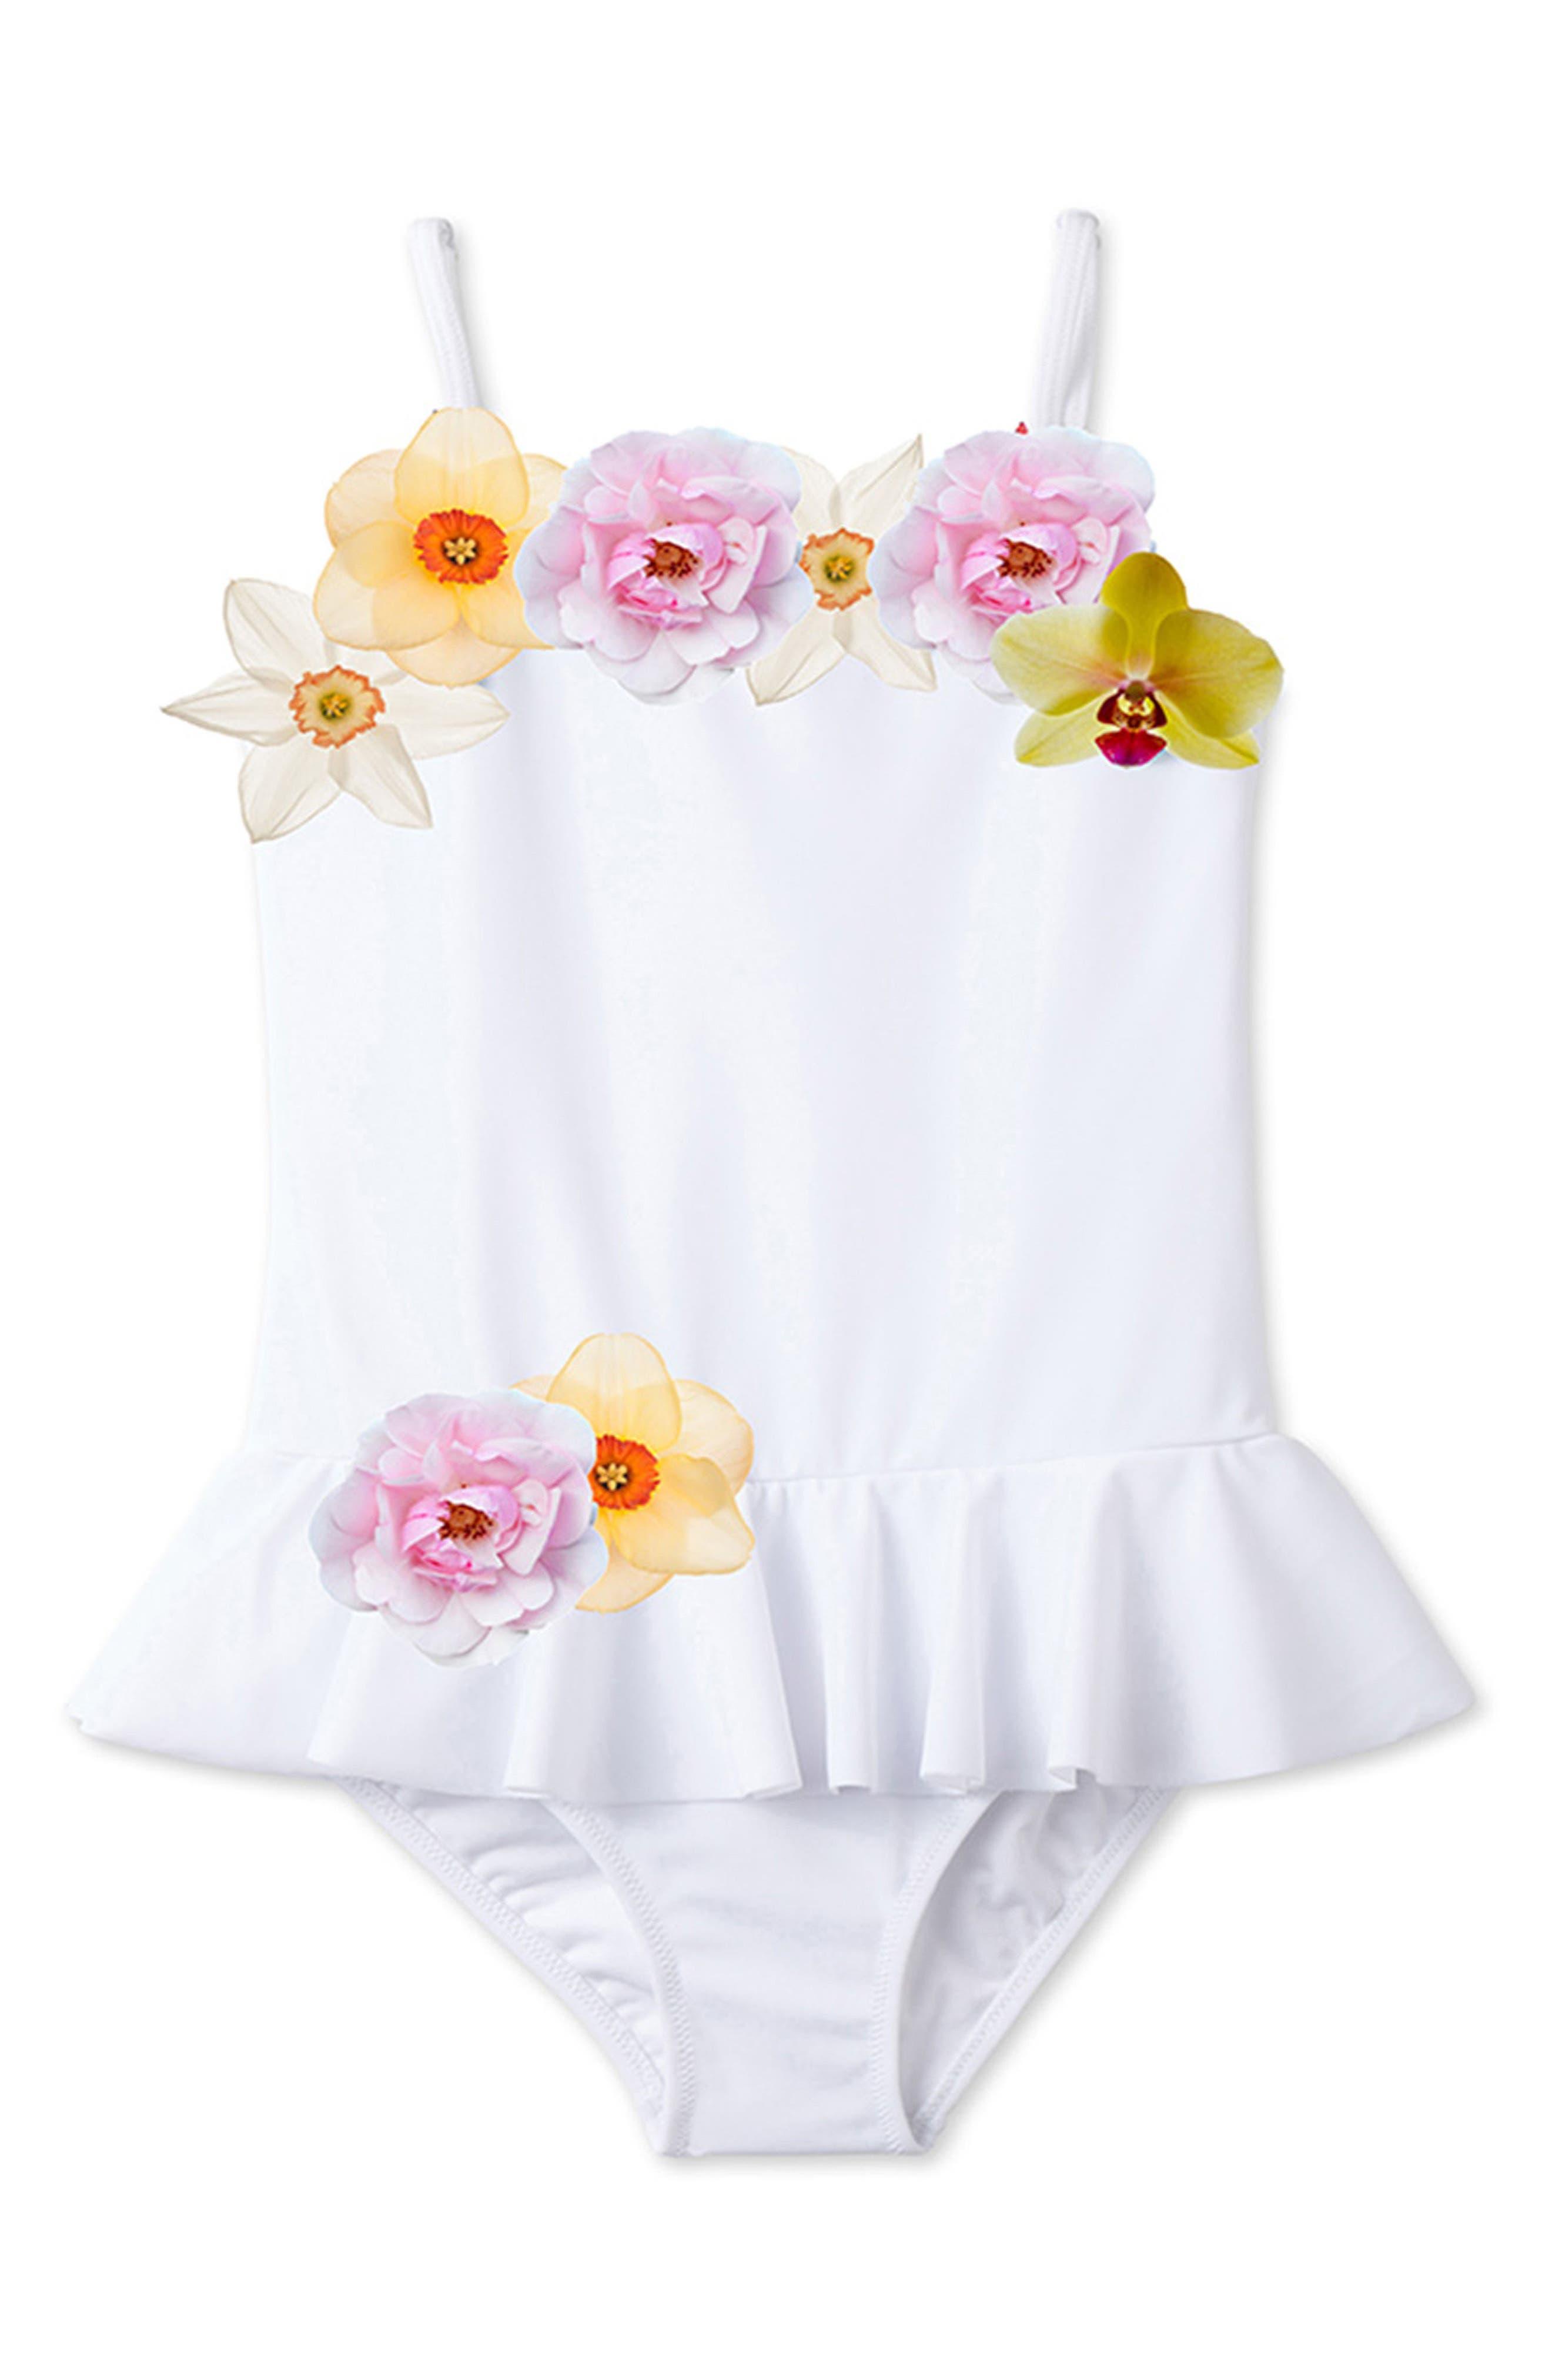 3D Floral One-Piece Swimsuit,                         Main,                         color, White